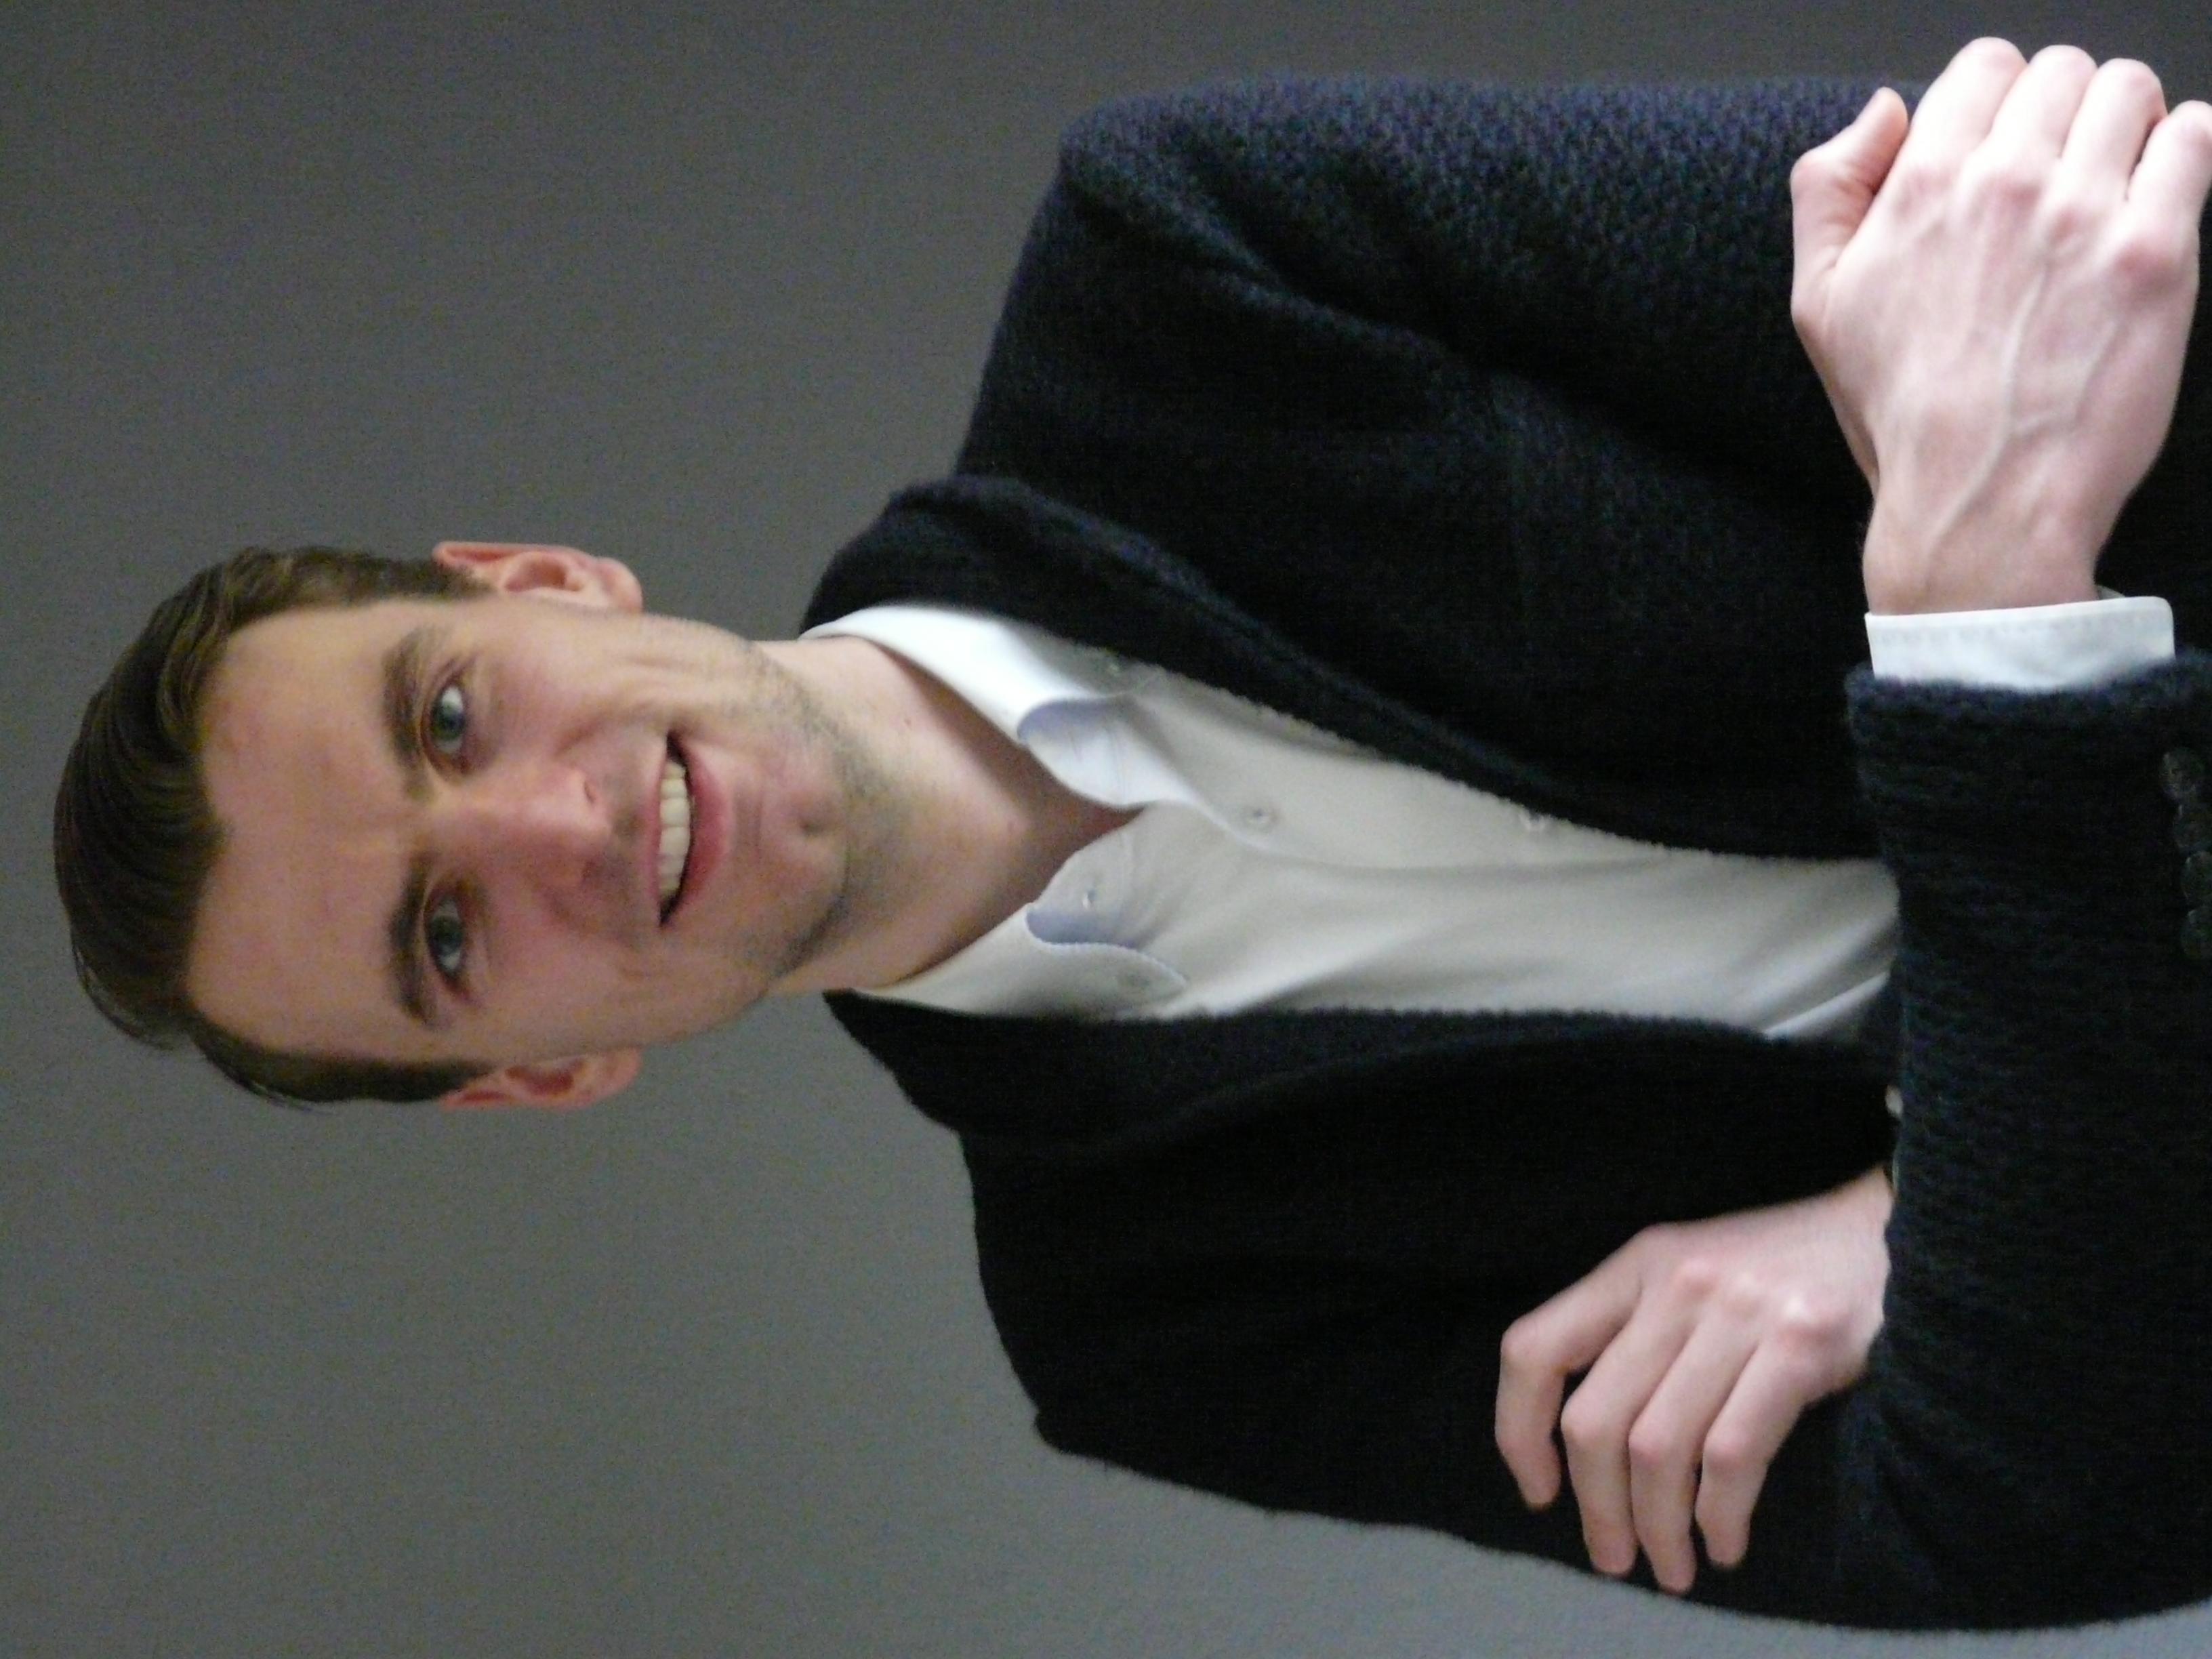 Lennart Haas interview shimano or pensioen